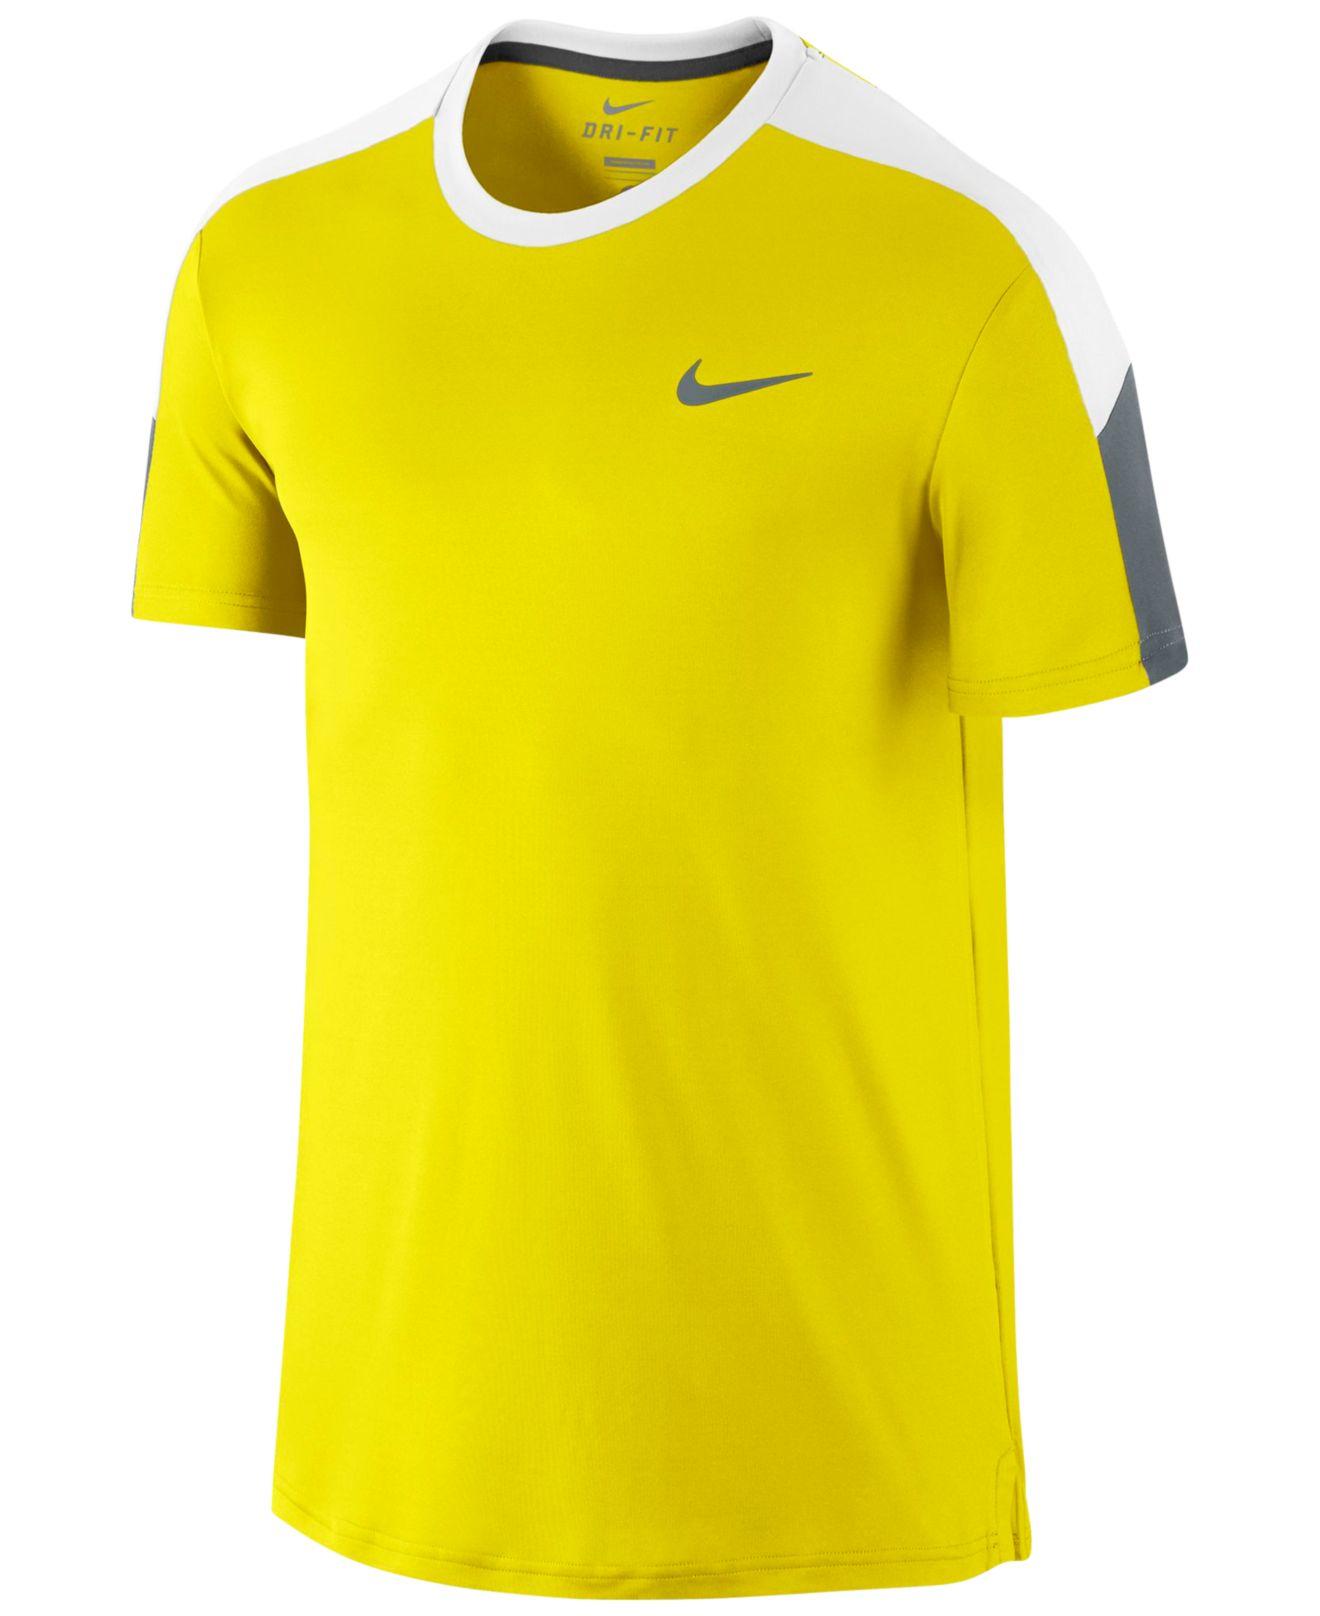 Lyst Nike Men 39 S Team Court Dri Fit Tennis T Shirt In